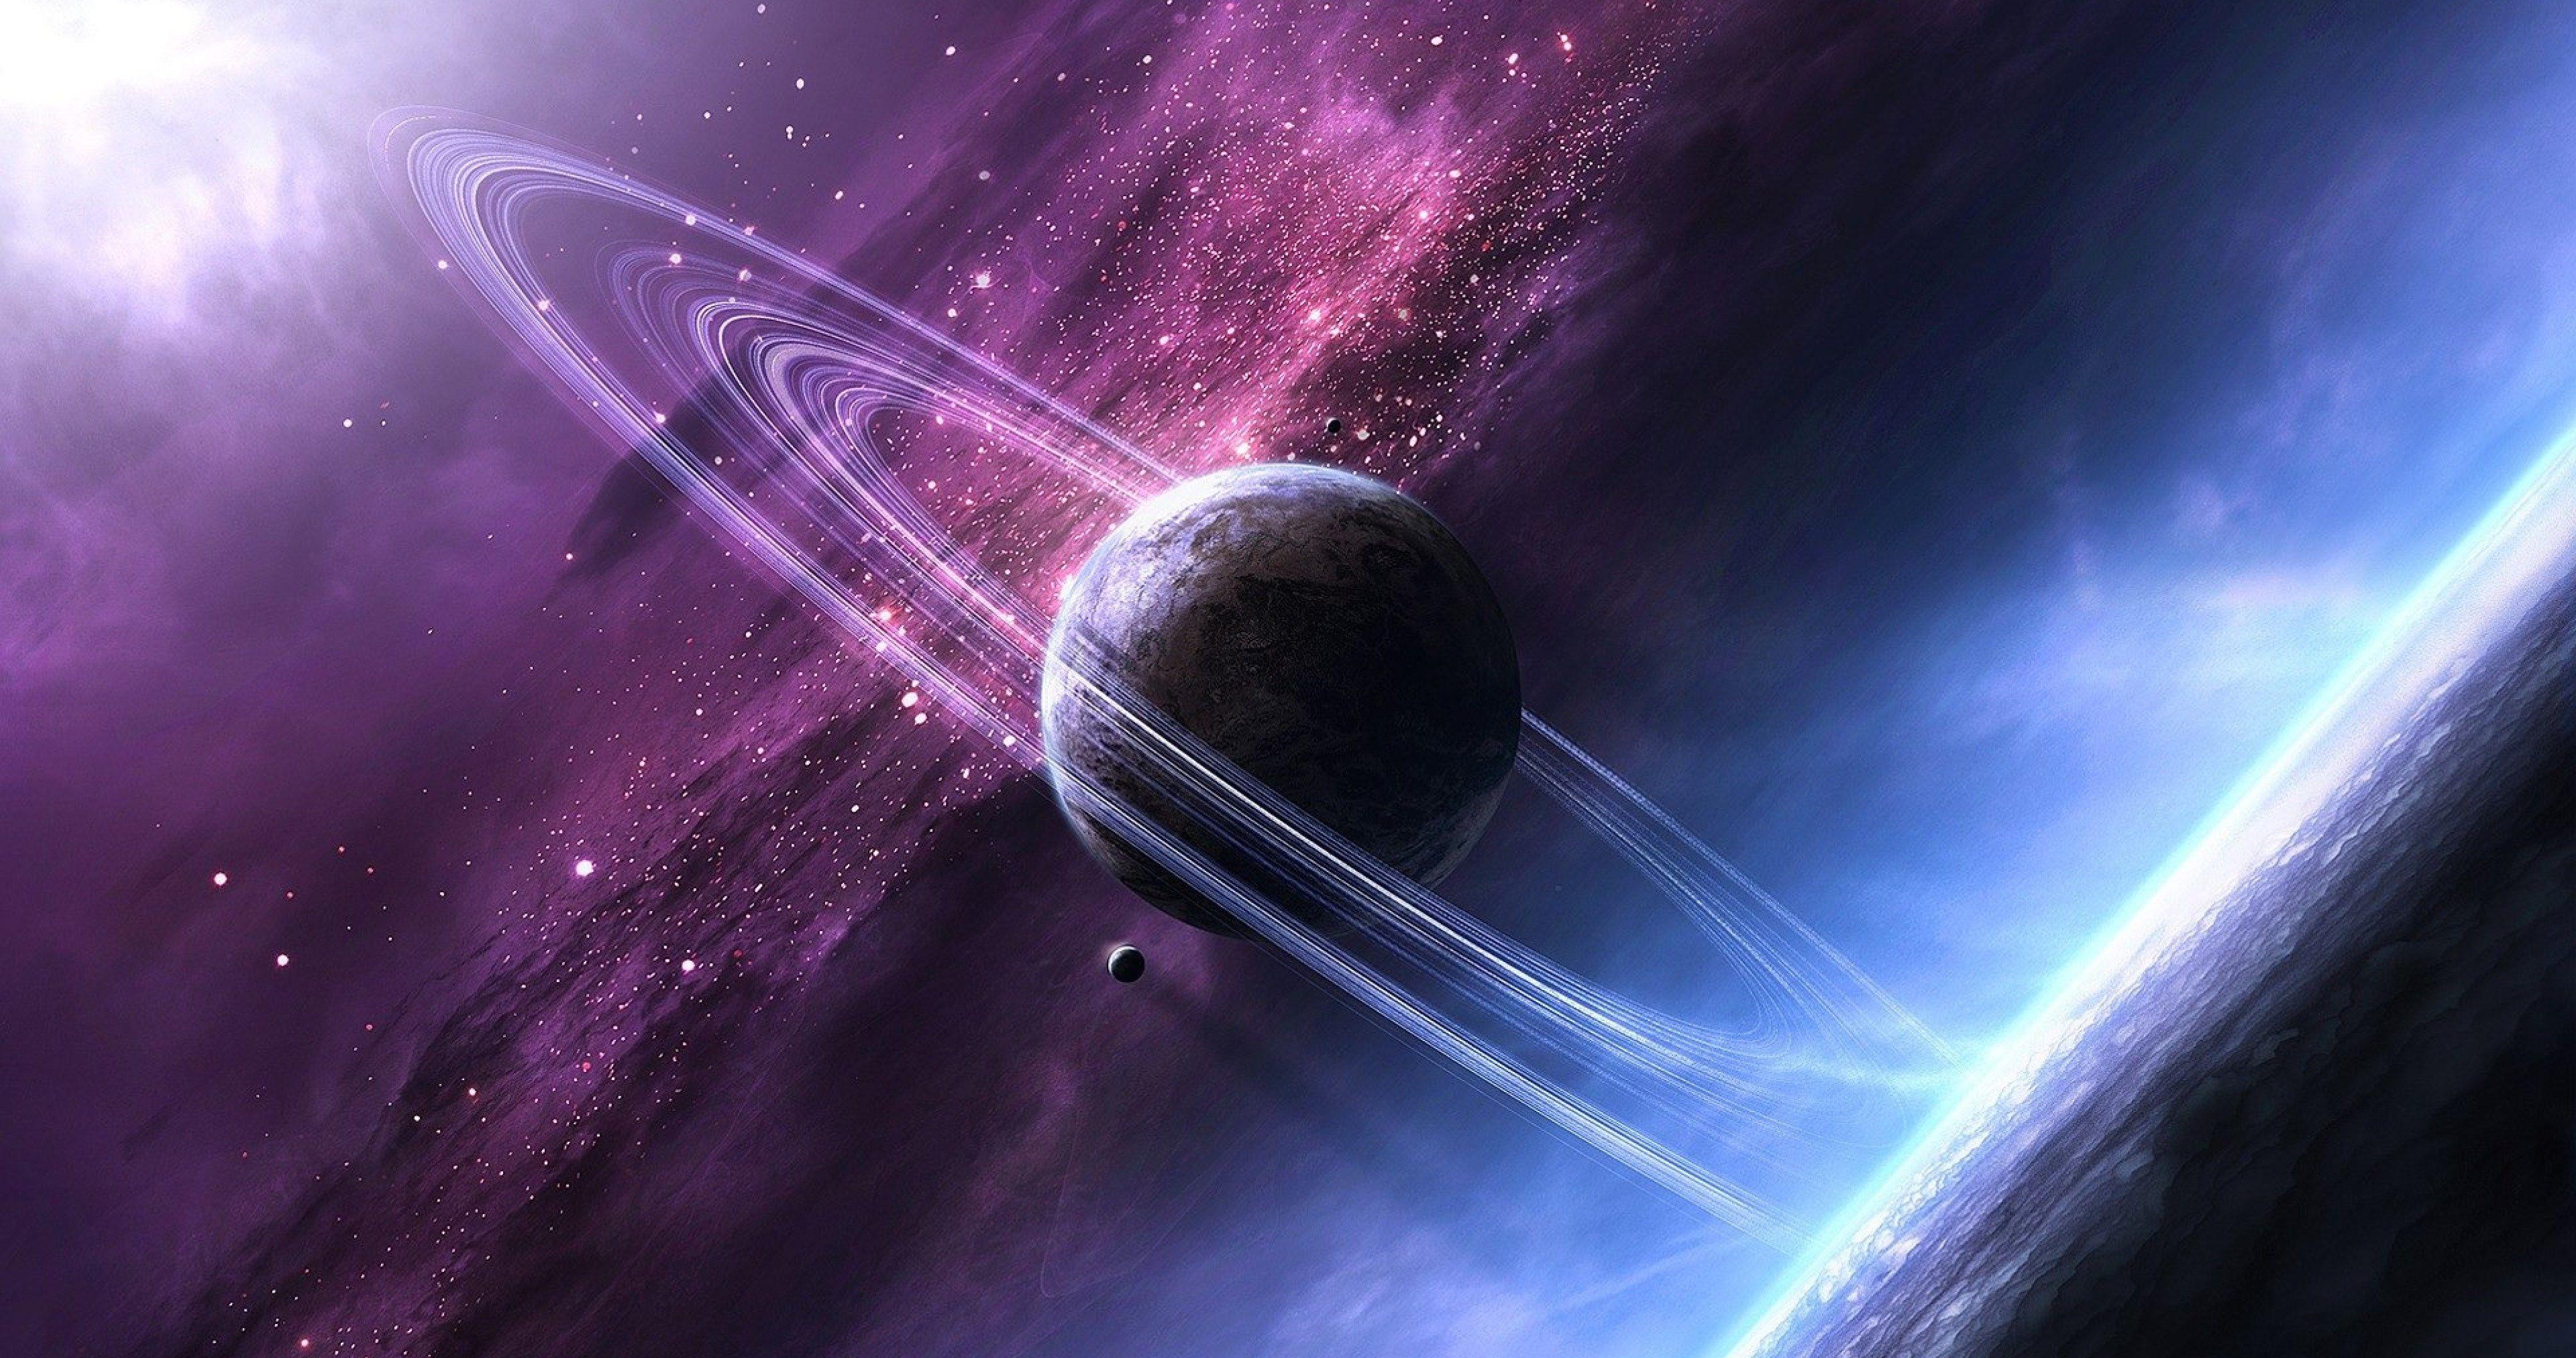 space planet rings 4k ultra hd wallpaper